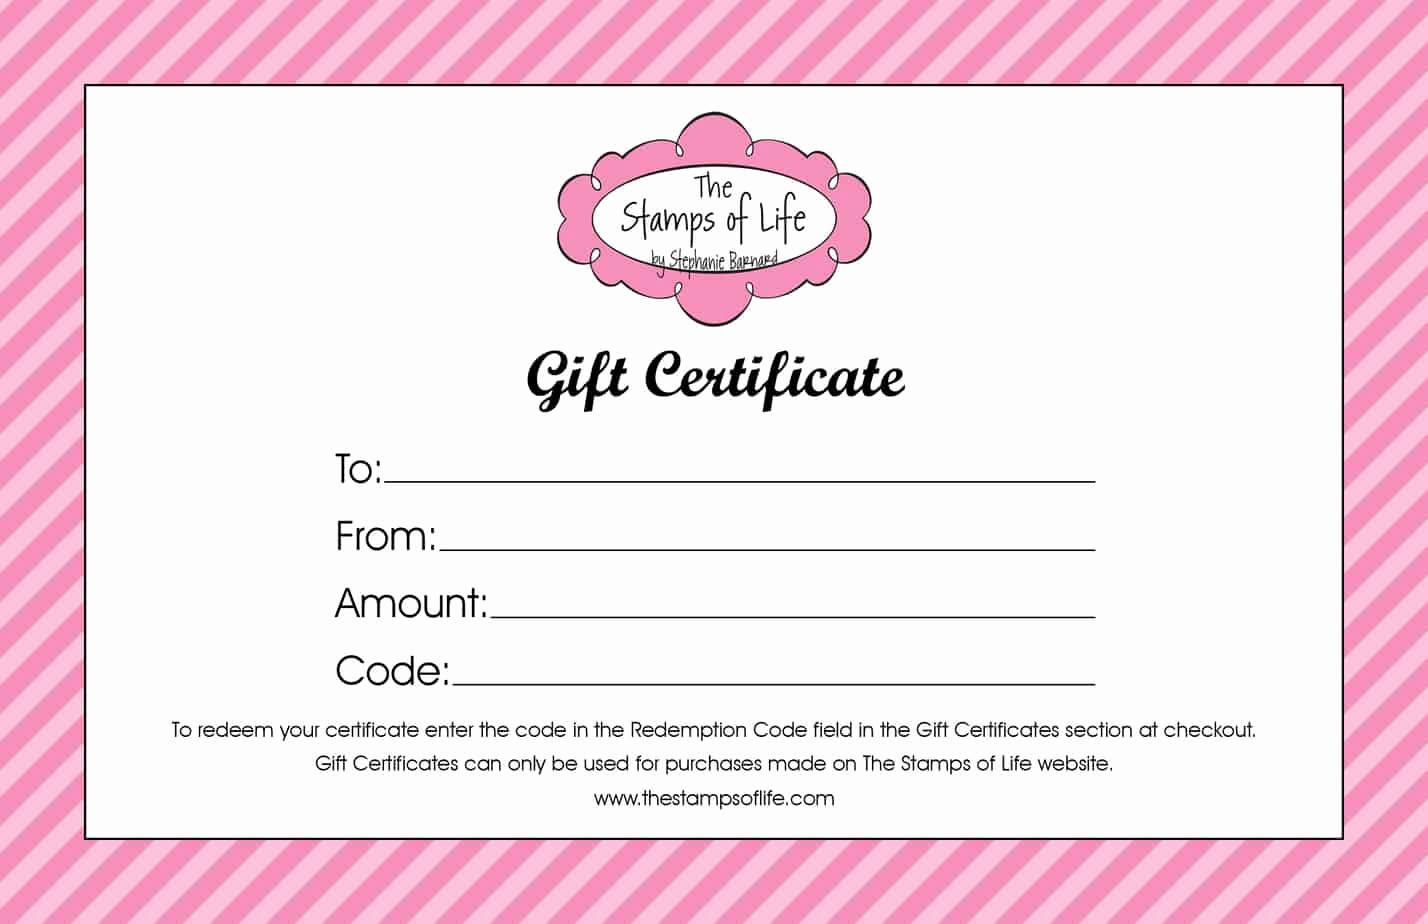 Word Template Gift Certificate Beautiful 21 Free Free Gift Certificate Templates Word Excel formats